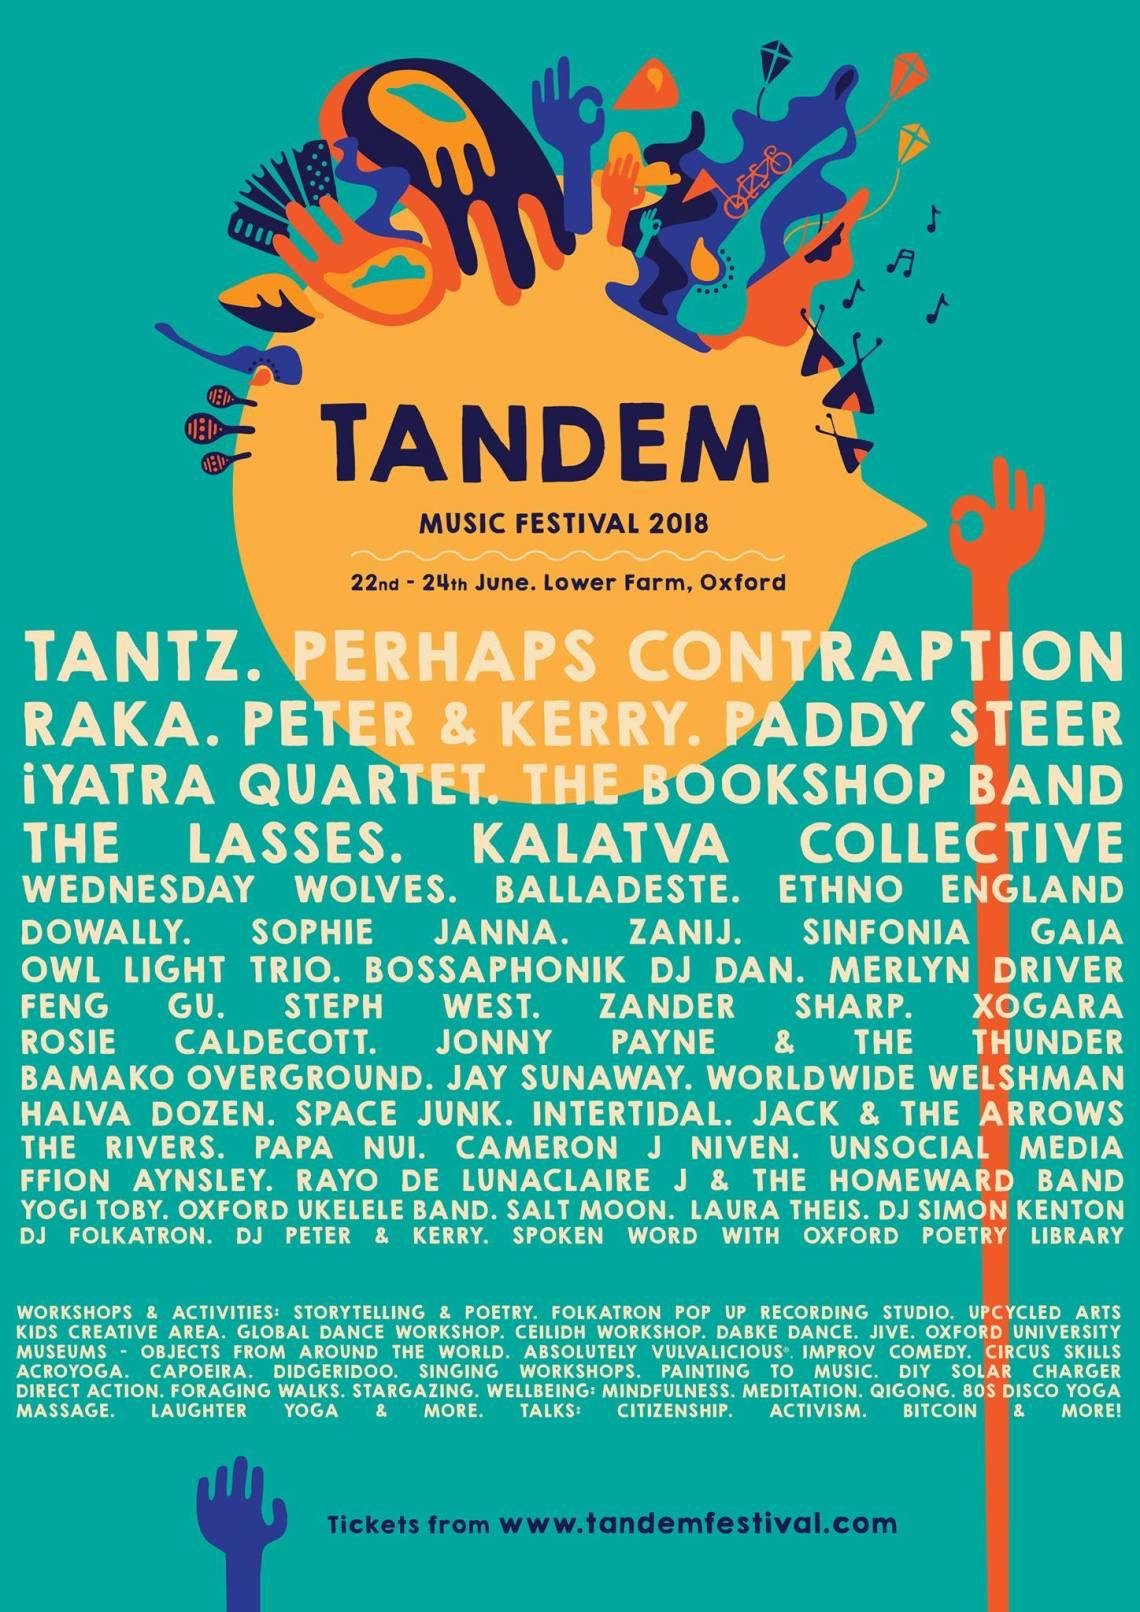 TANDEM FESTIVAL 2018 @ Lower Farm Oxford